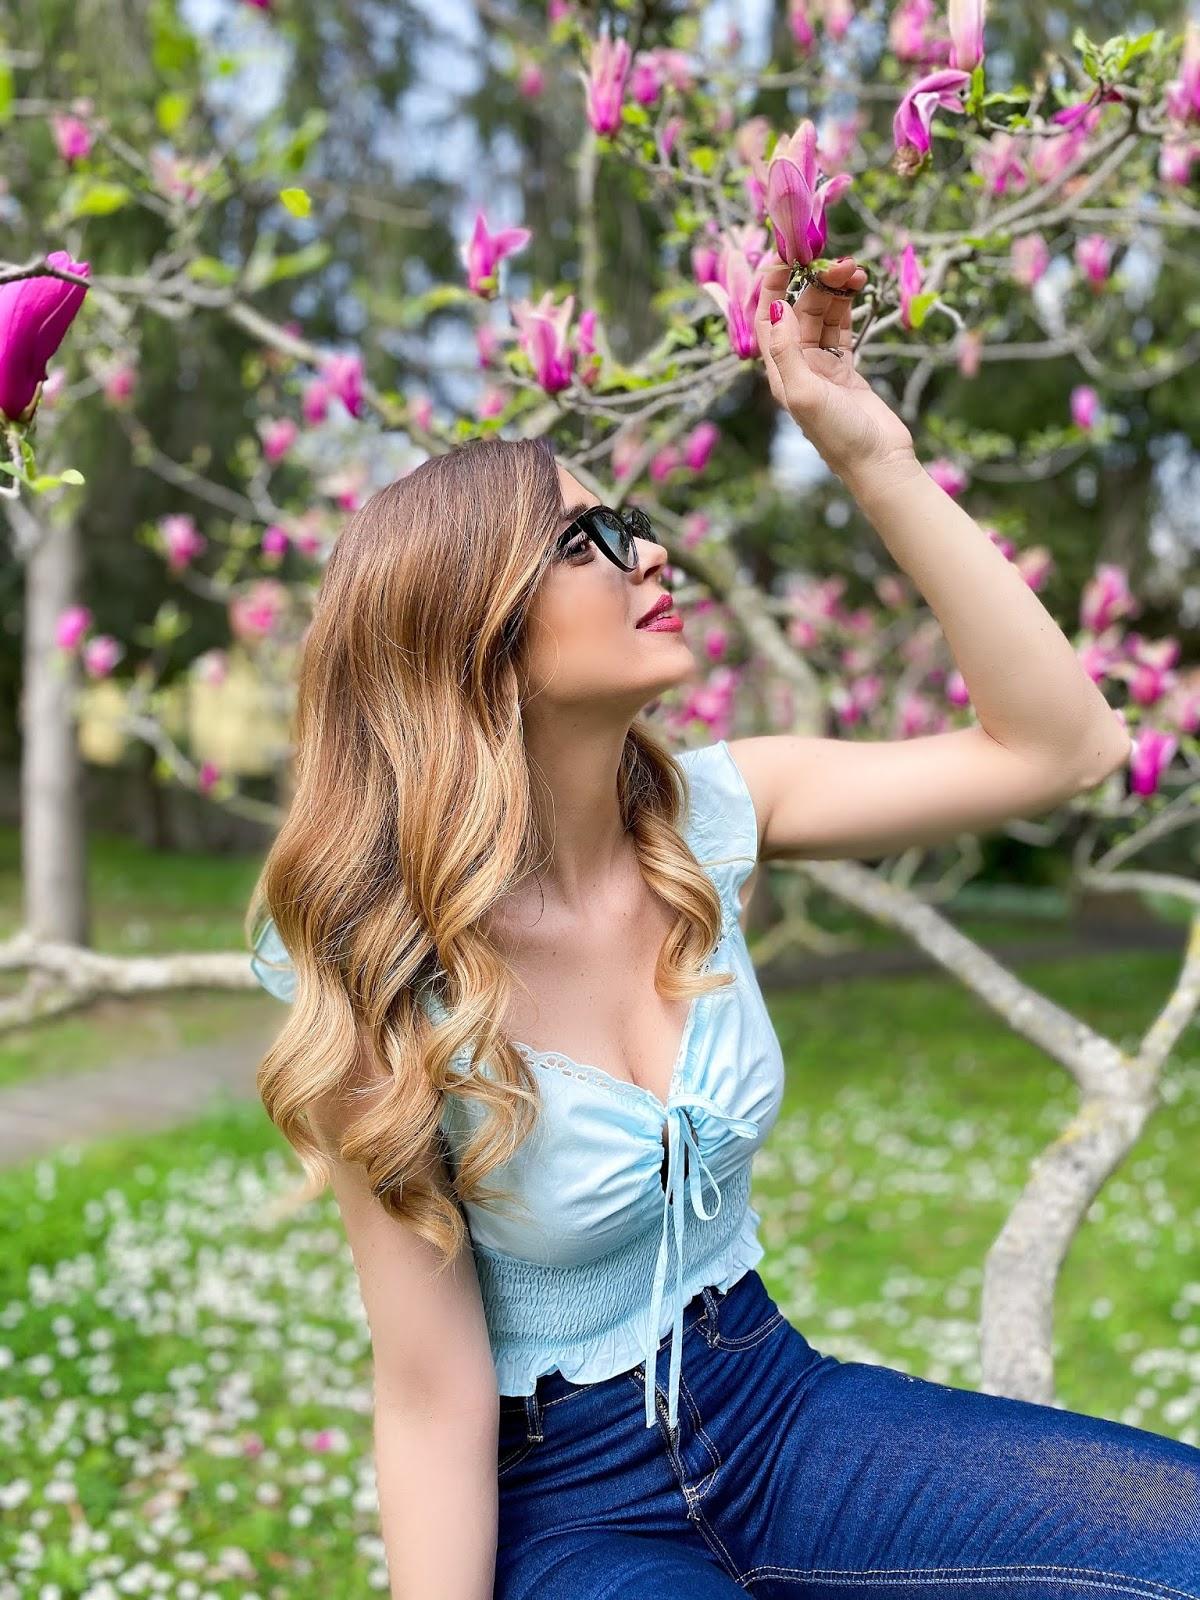 Quattro nuovi look da indossare ad aprile